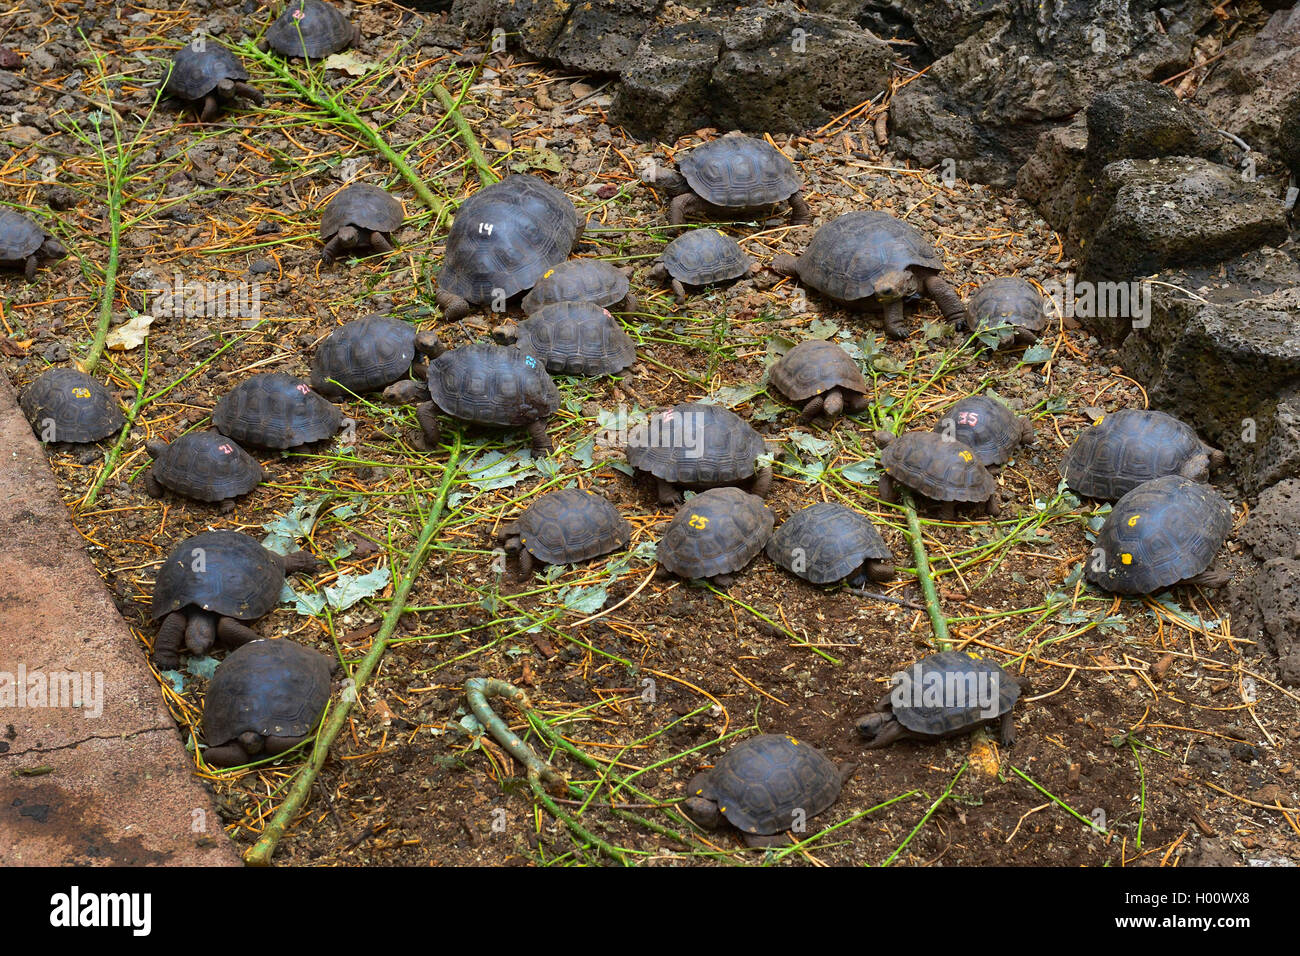 Galapagos-Riesenschildkroete, Galapagosriesenschildkroete, Galapagos-Schildkroete, Galapagosschildkroete, Elefantenschildkroete, - Stock Image